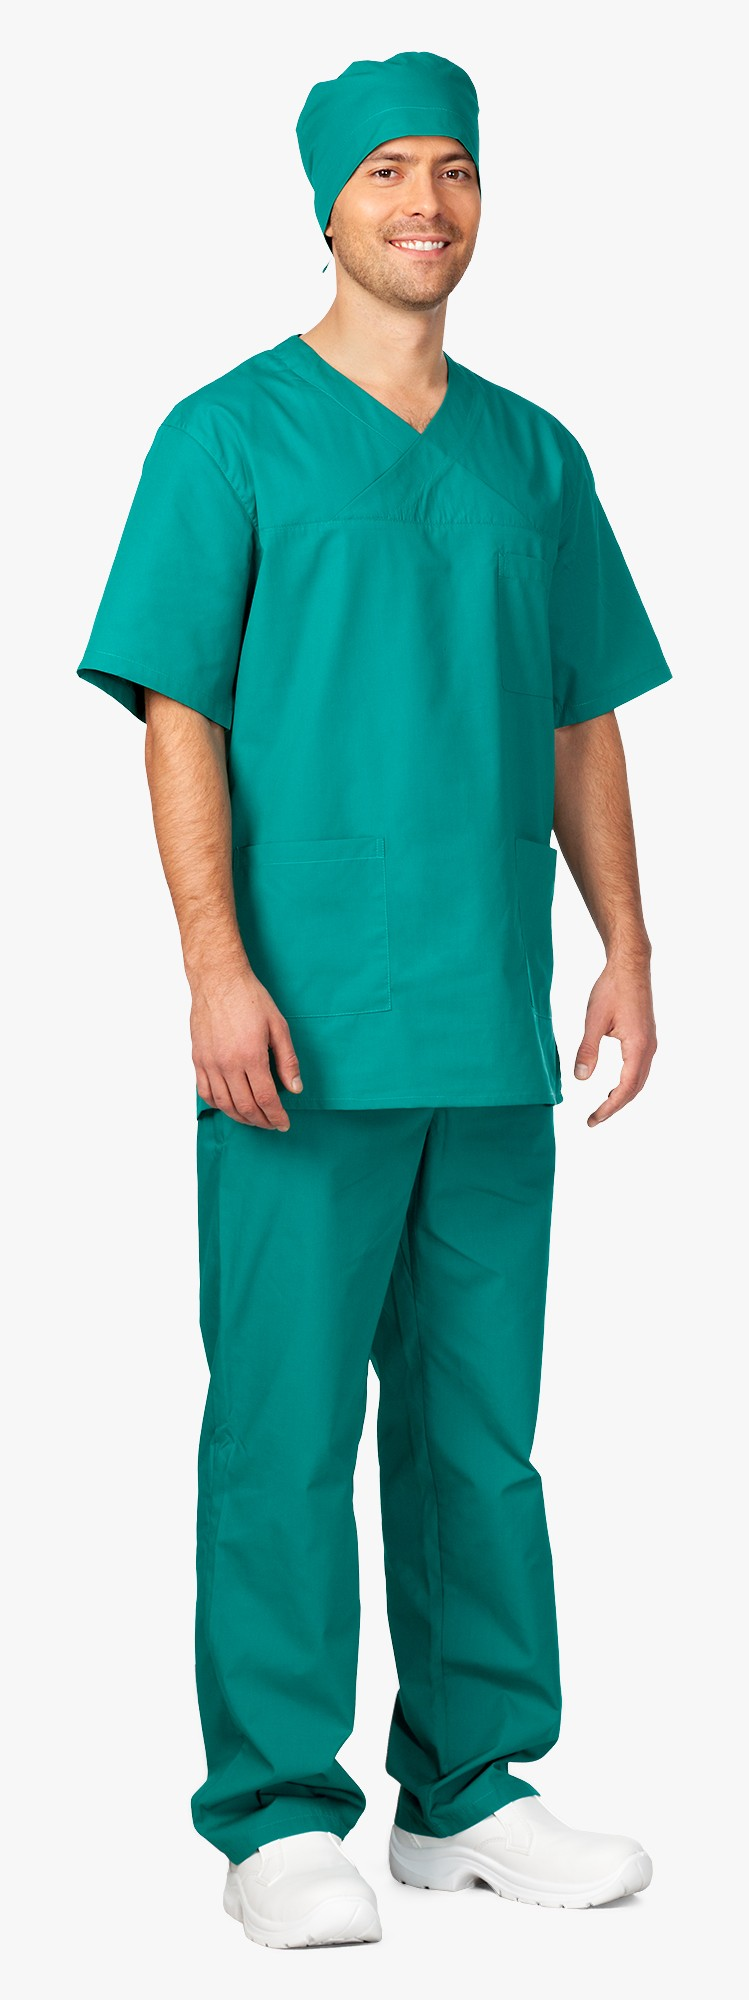 3.341 komplet pánský chirurgický, zelený